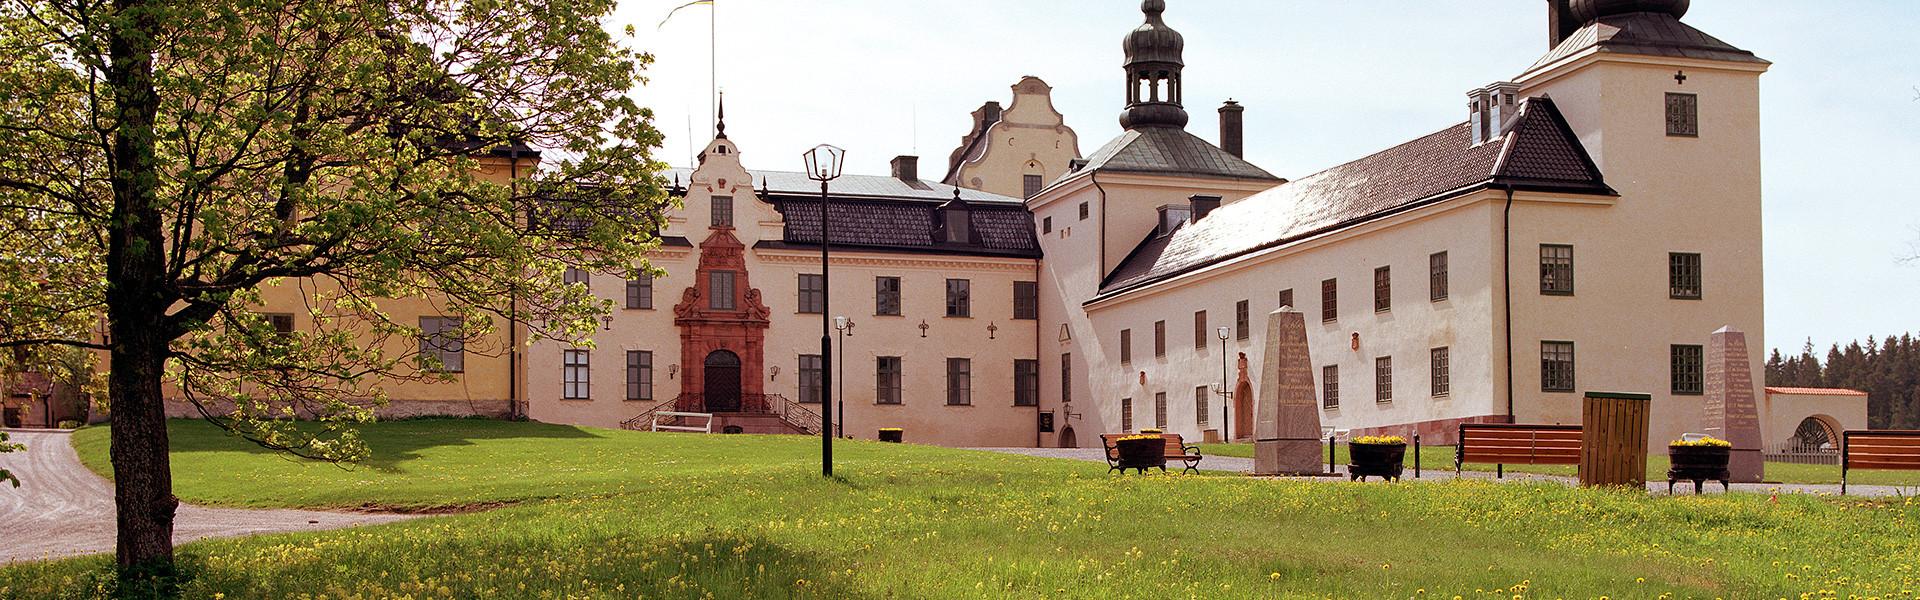 Tyresö Palace